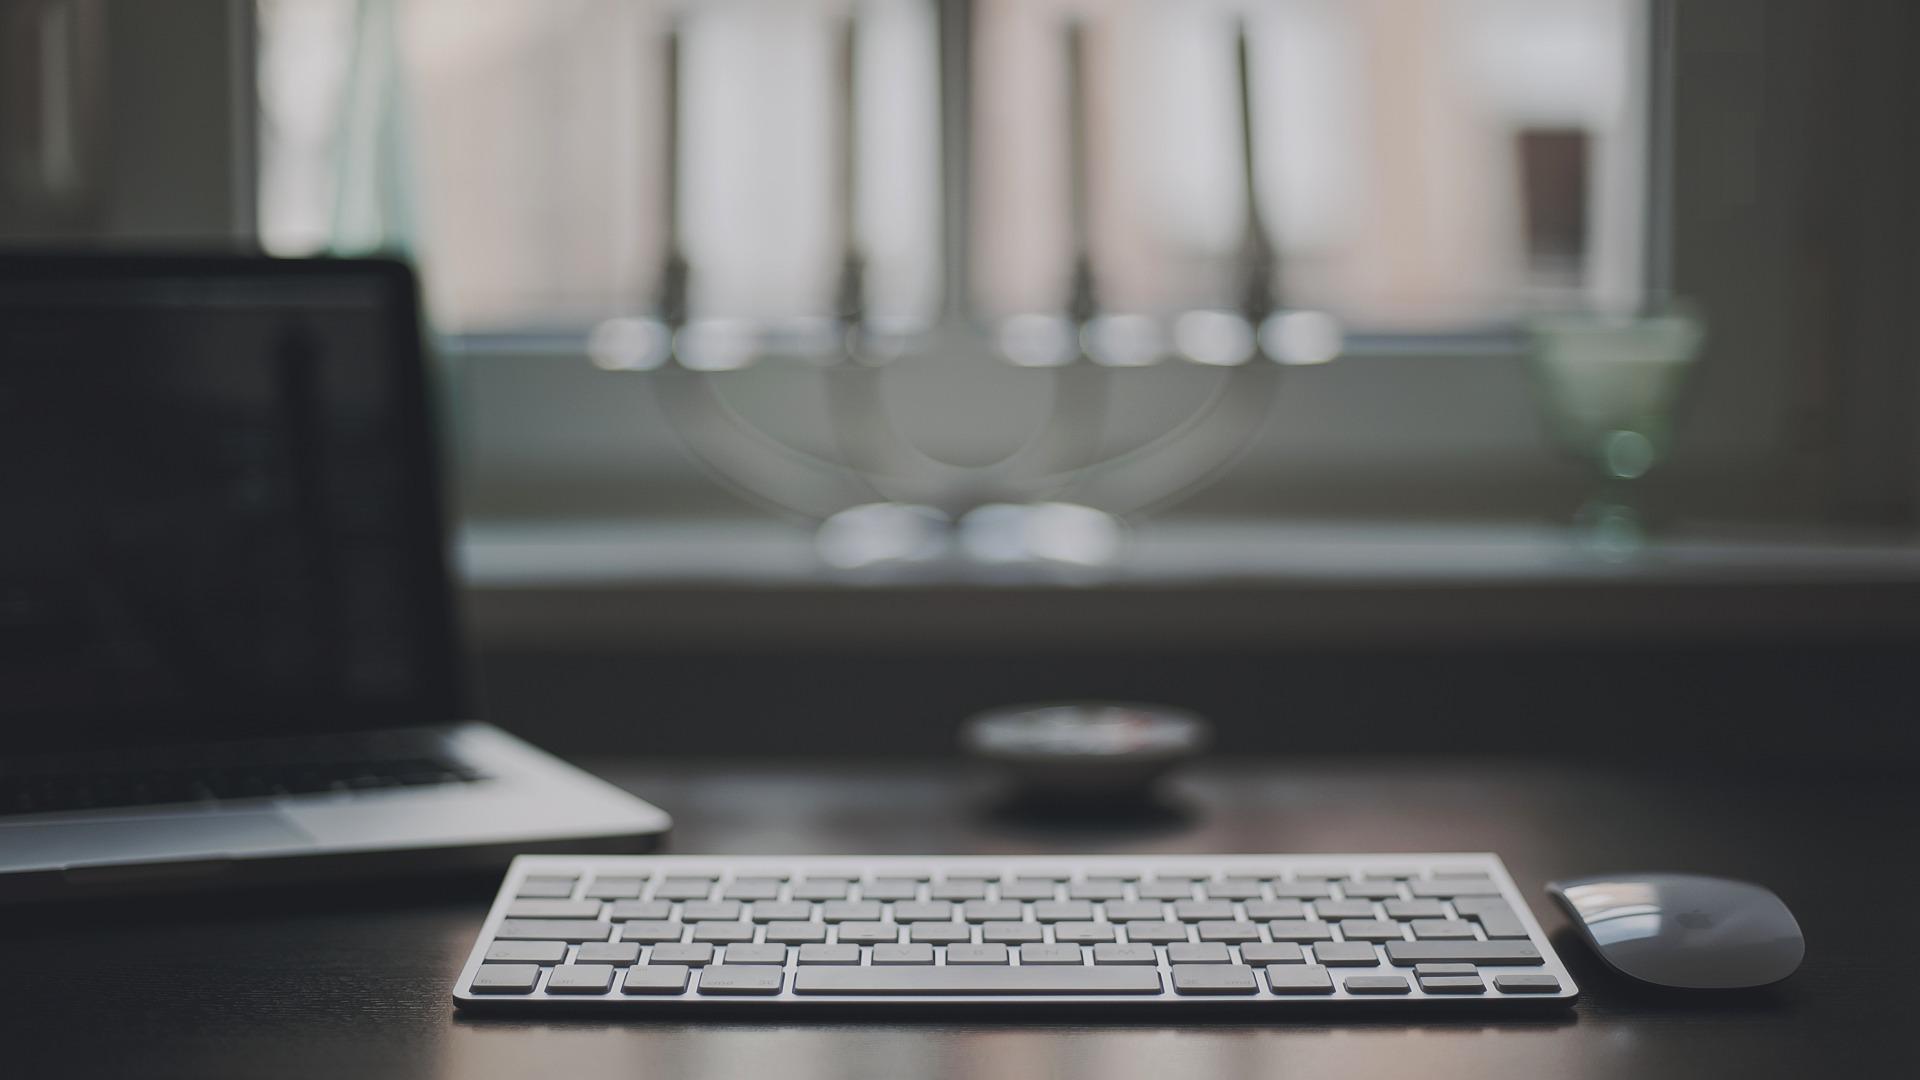 тоненький ноутбук без регистрации